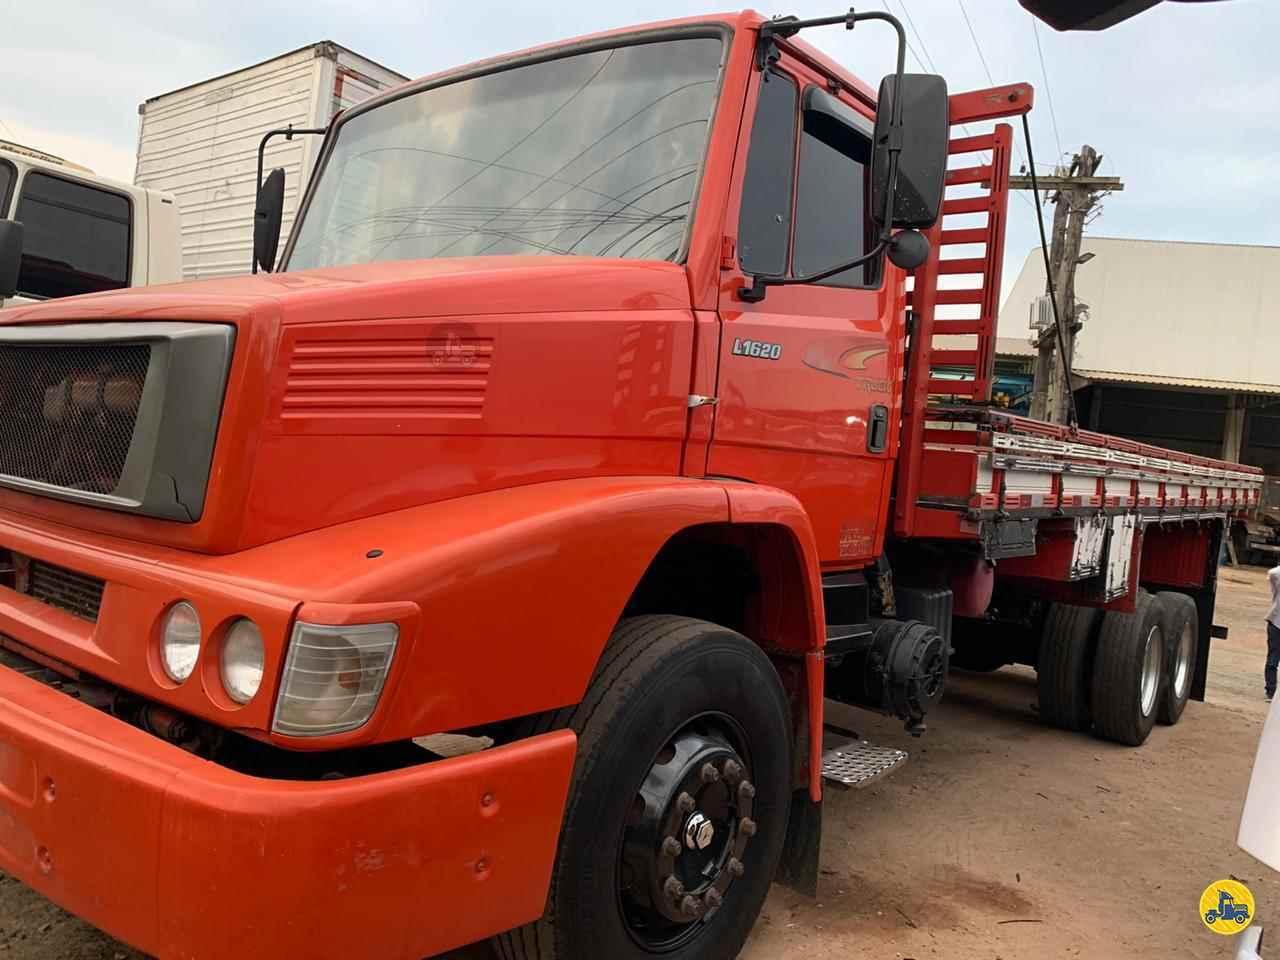 MERCEDES-BENZ MB 1620 400000km 2005/2005 Borges Caminhões